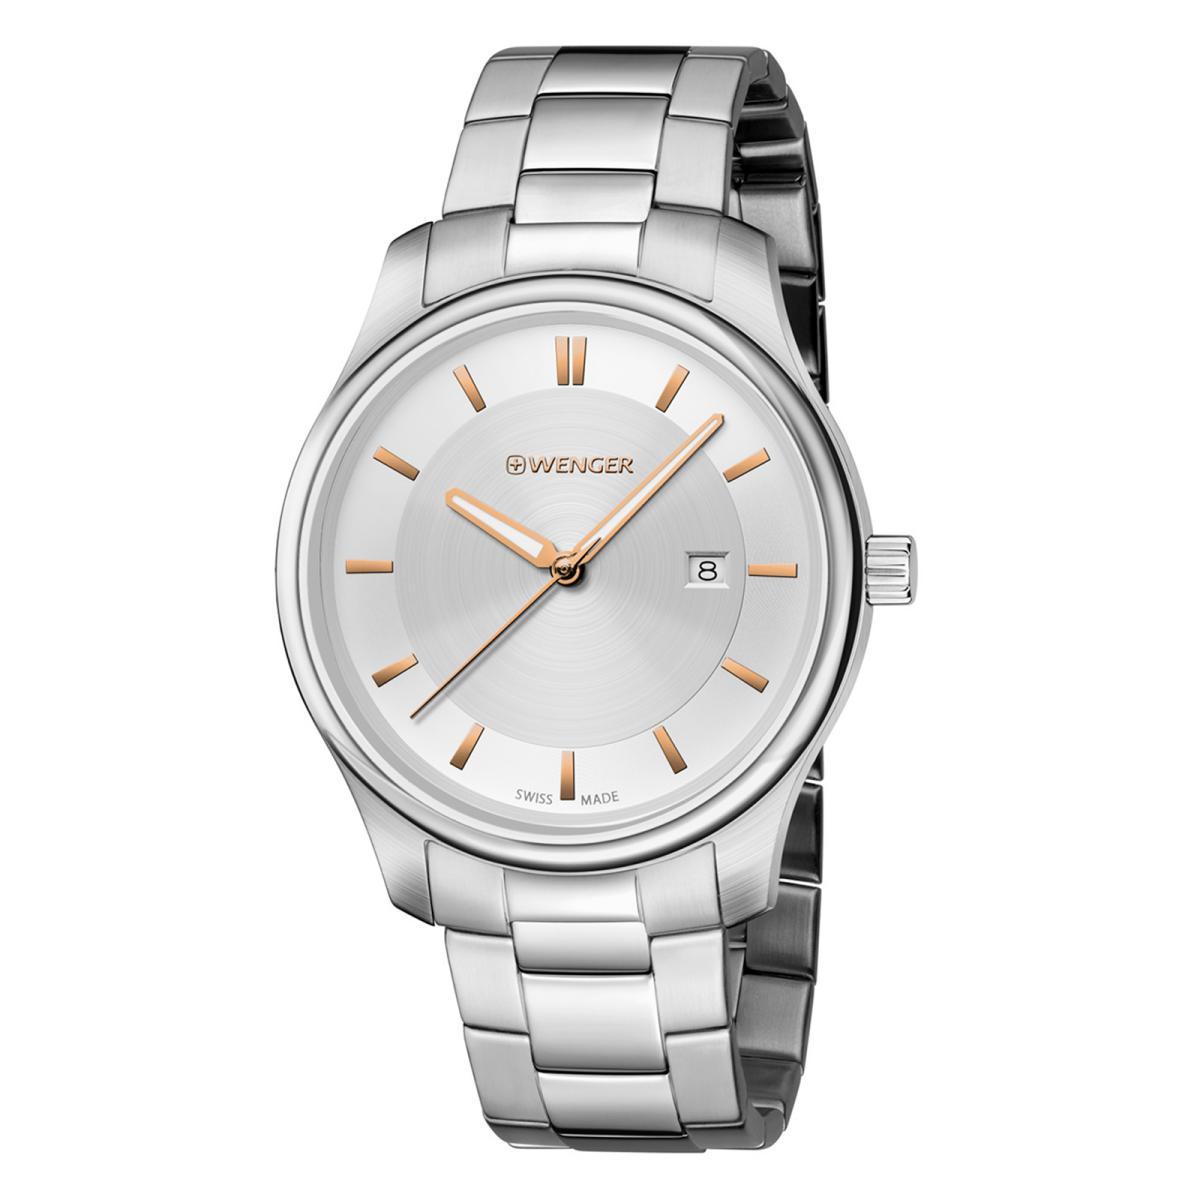 c7e27a91ce93 Reloj Wenger - 01.1421.105 - MUJER - Time Square